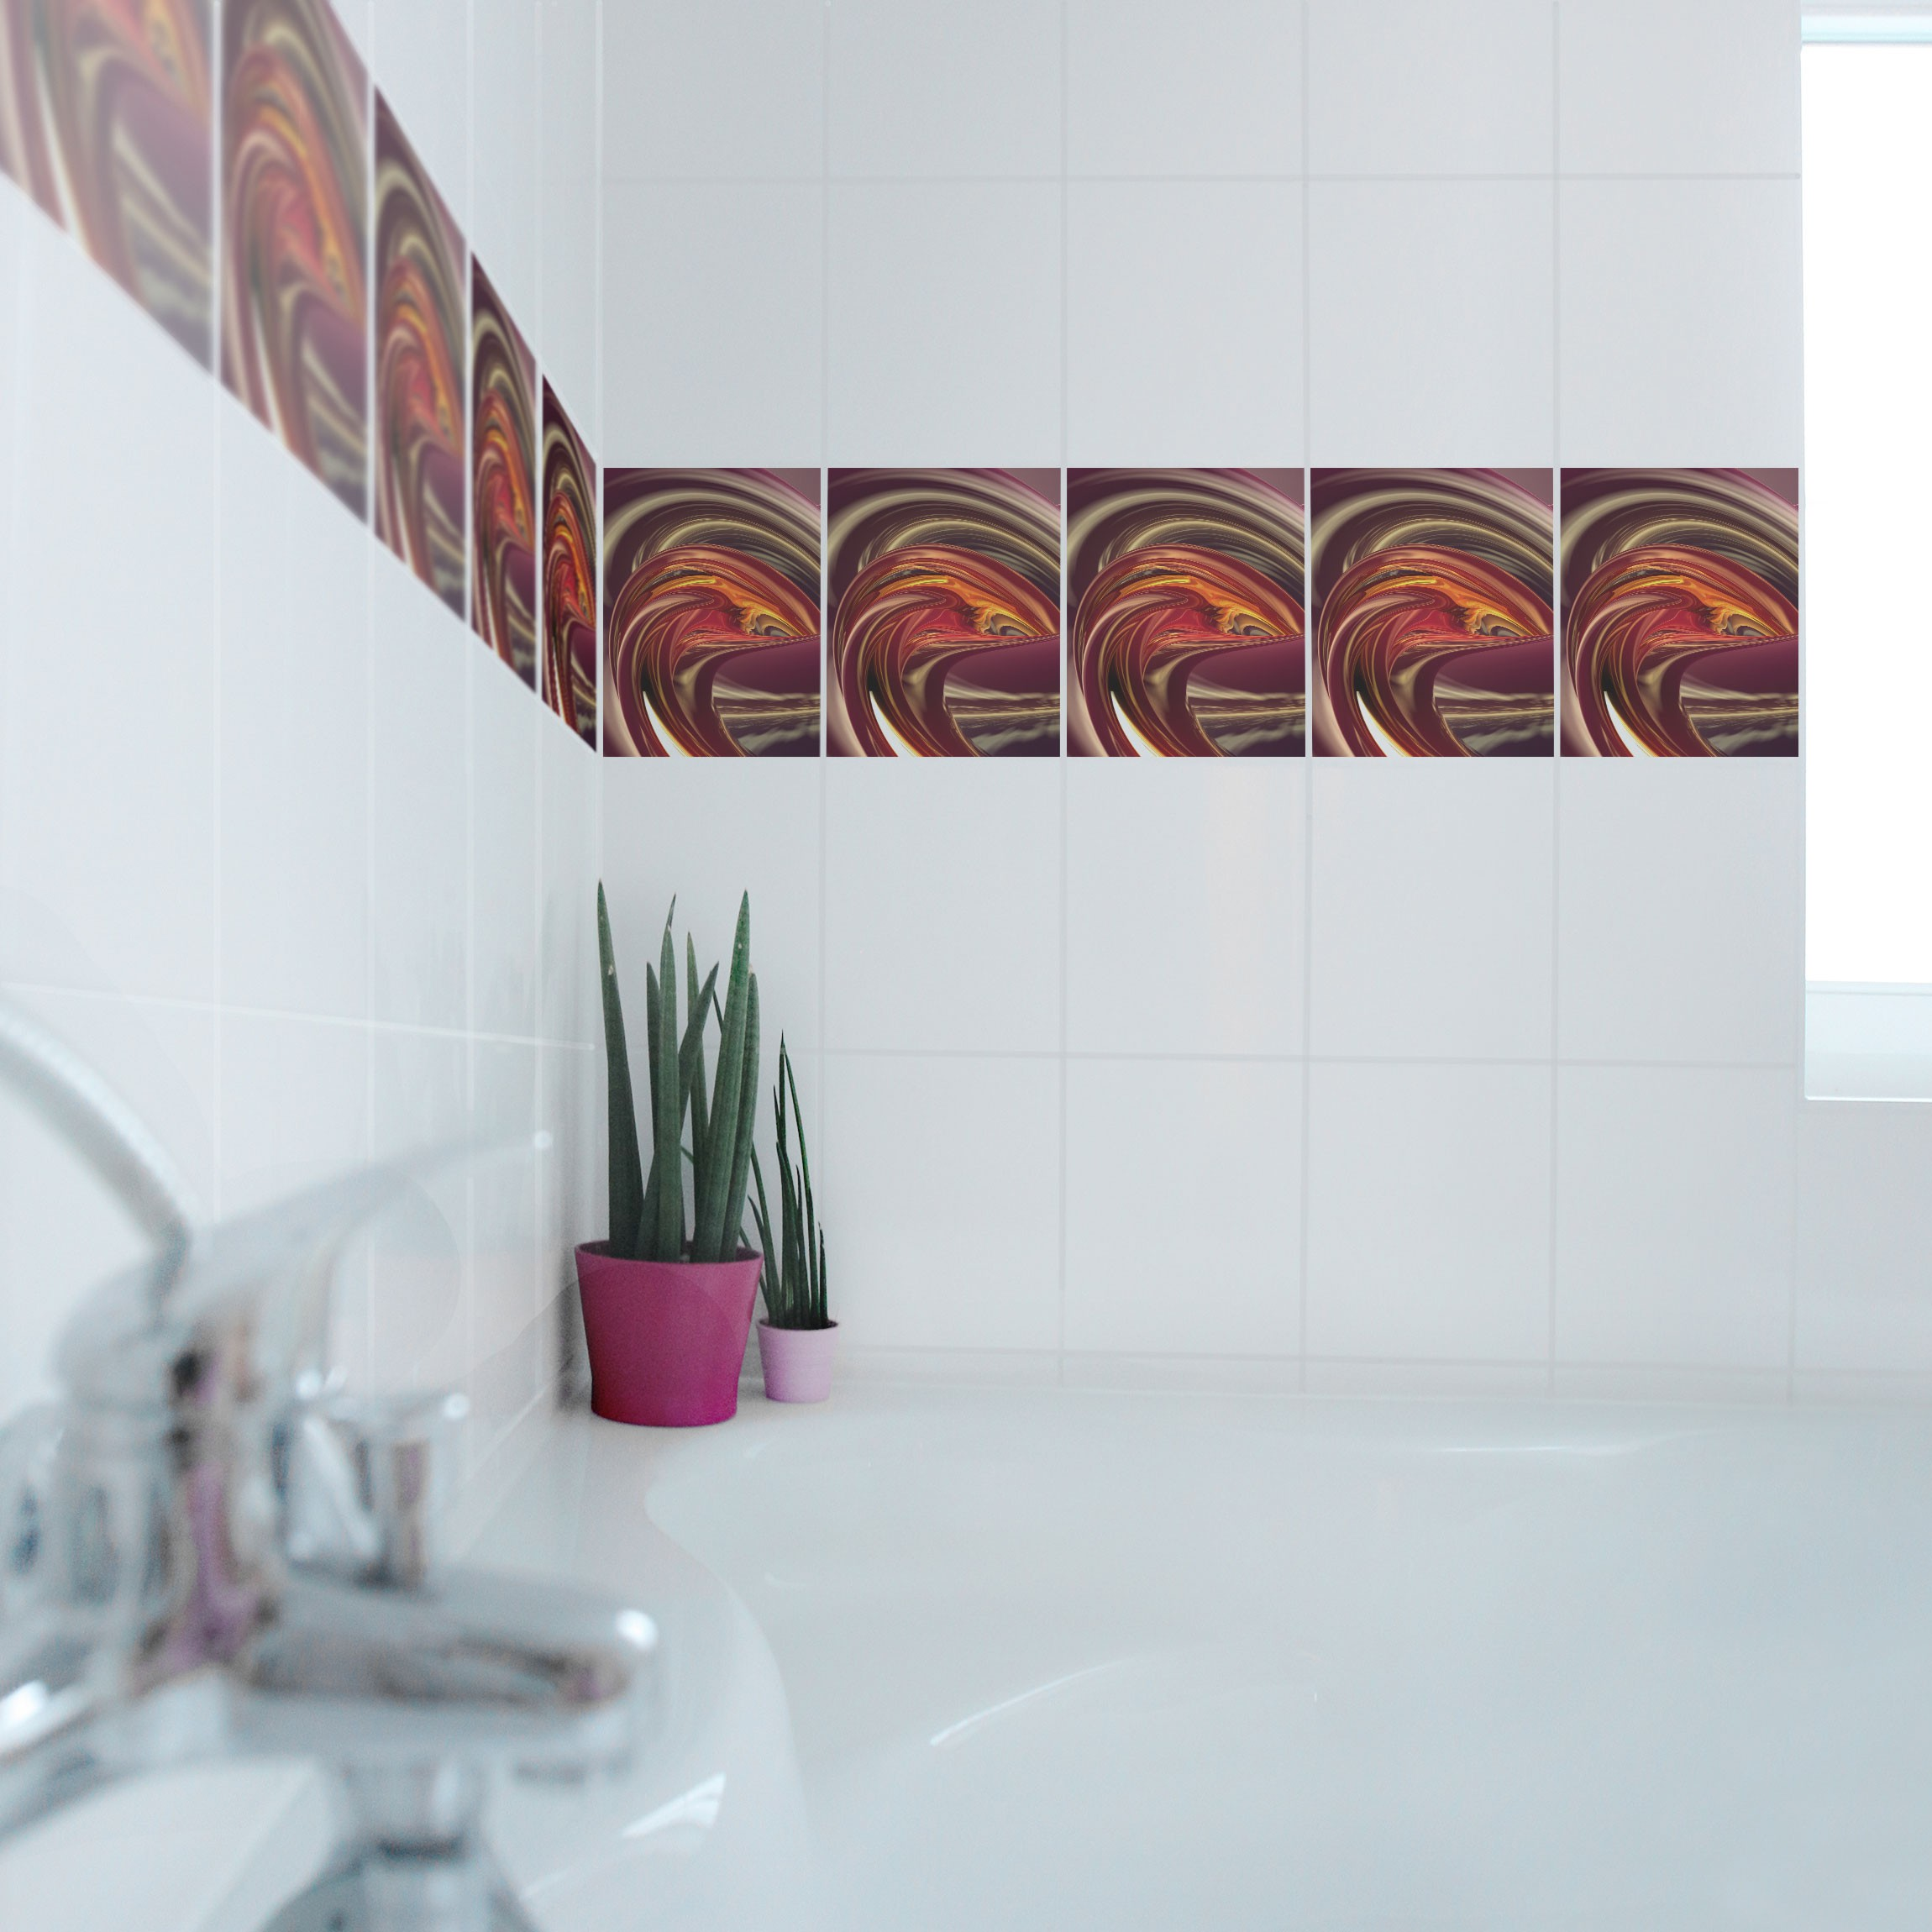 fliesen bord re fantastic burning 25x20 cm fliesenaufkleber. Black Bedroom Furniture Sets. Home Design Ideas